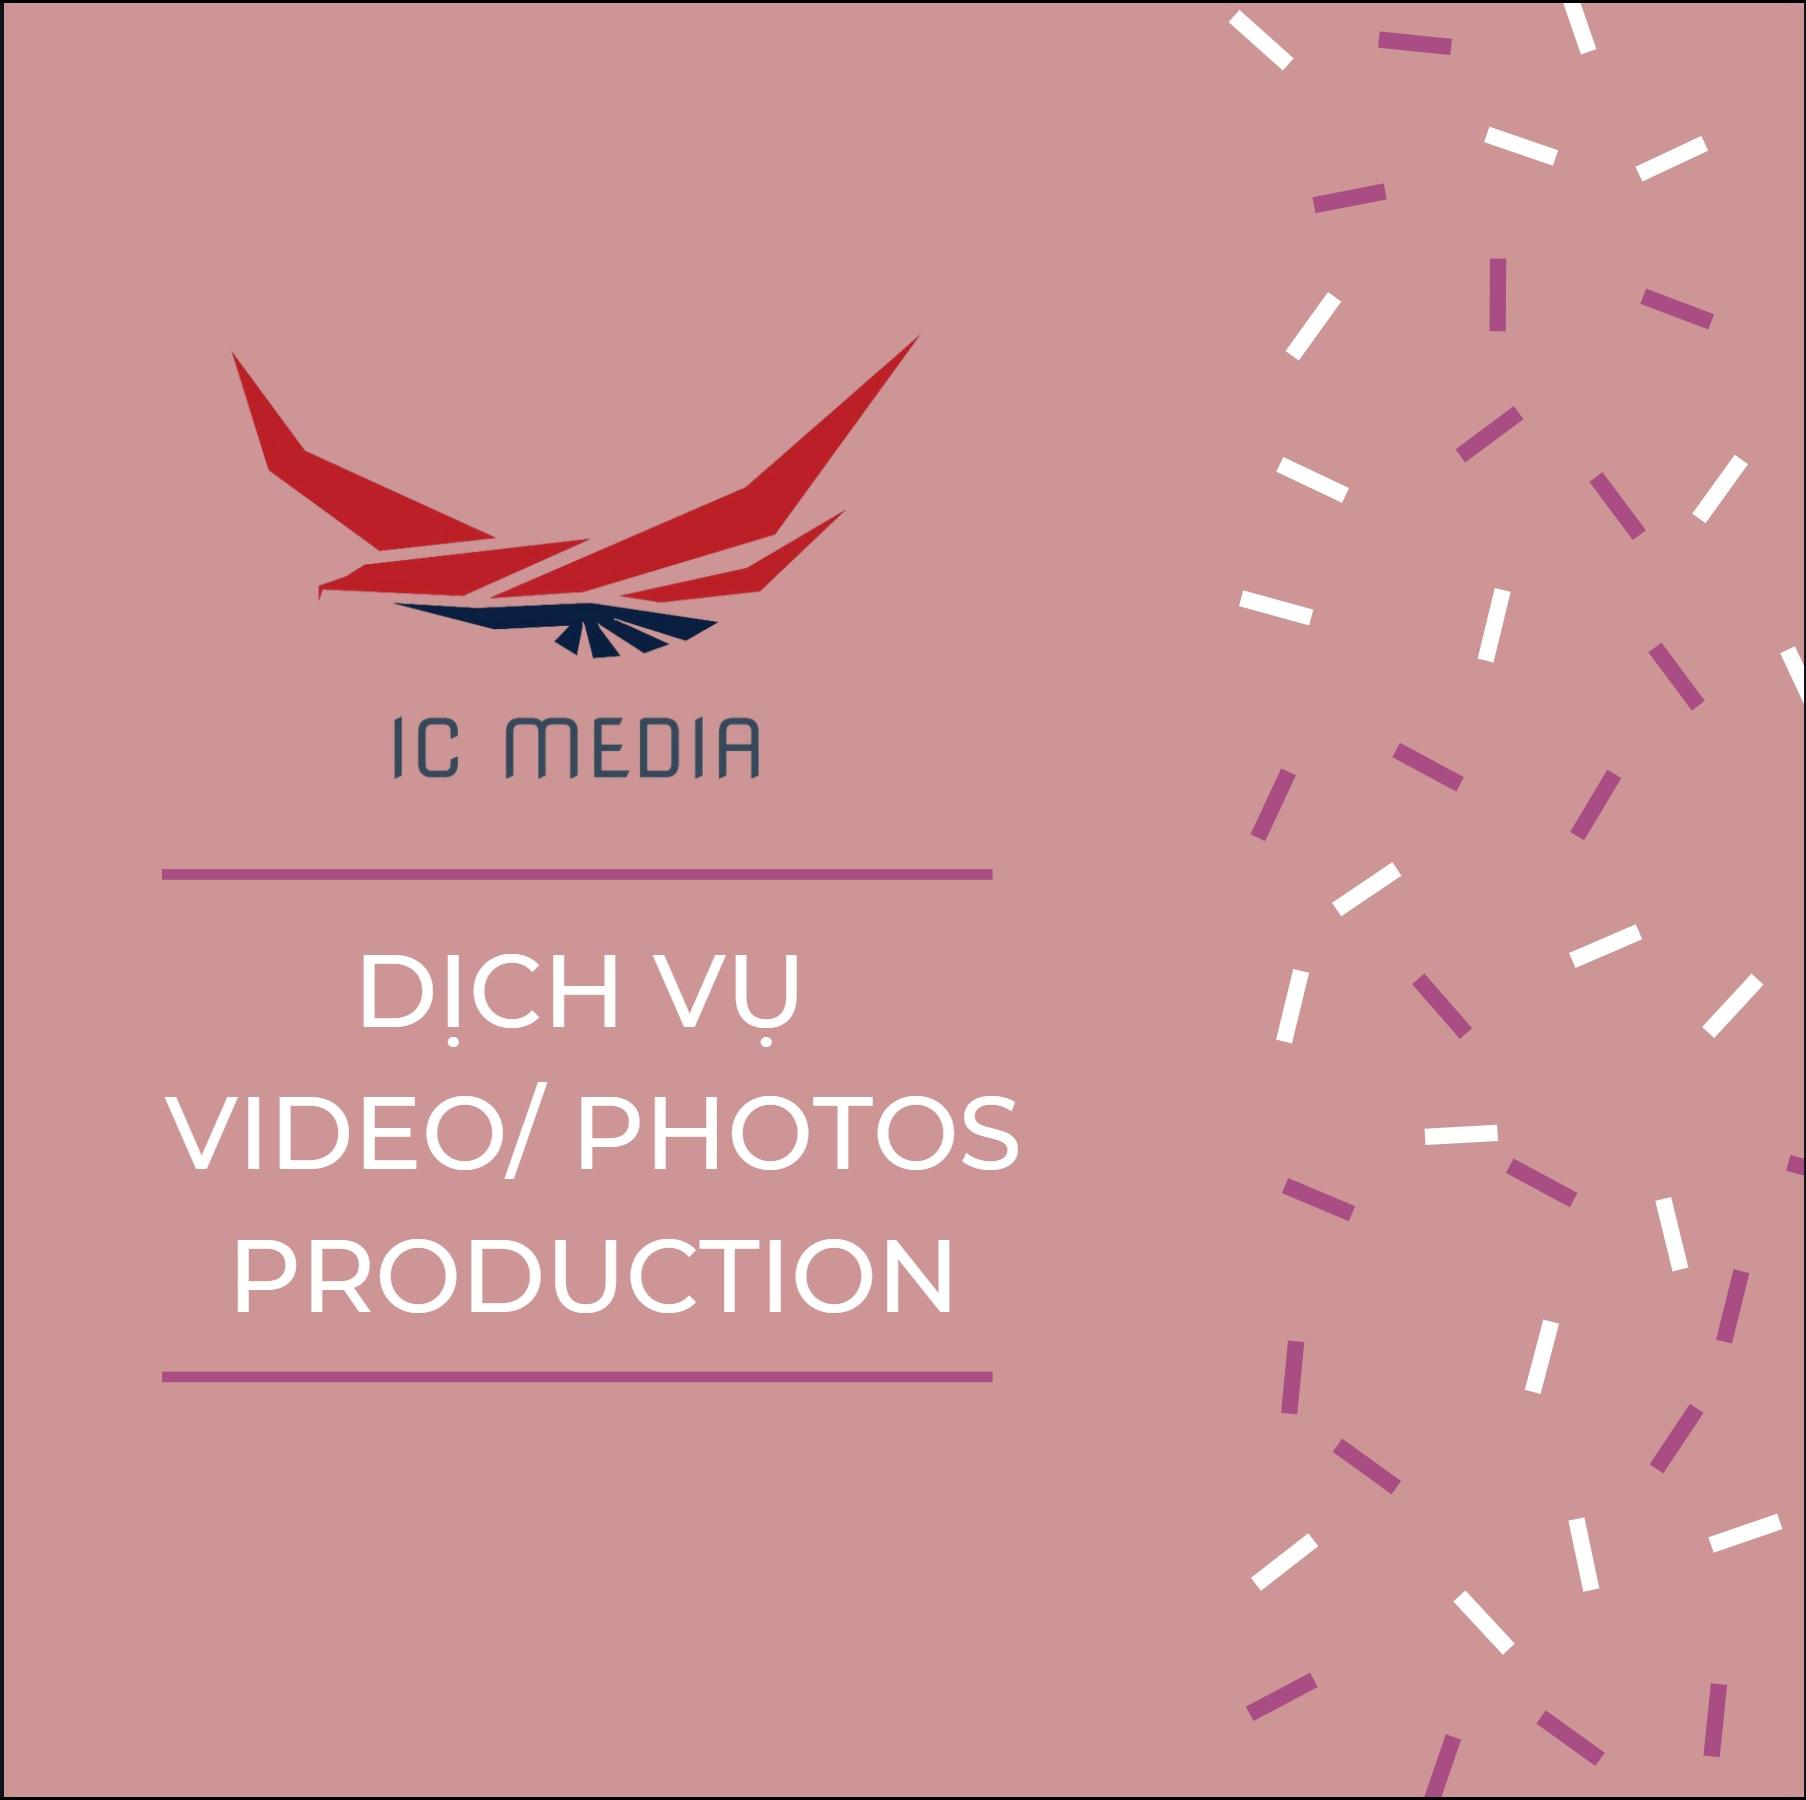 Video/ Photos production